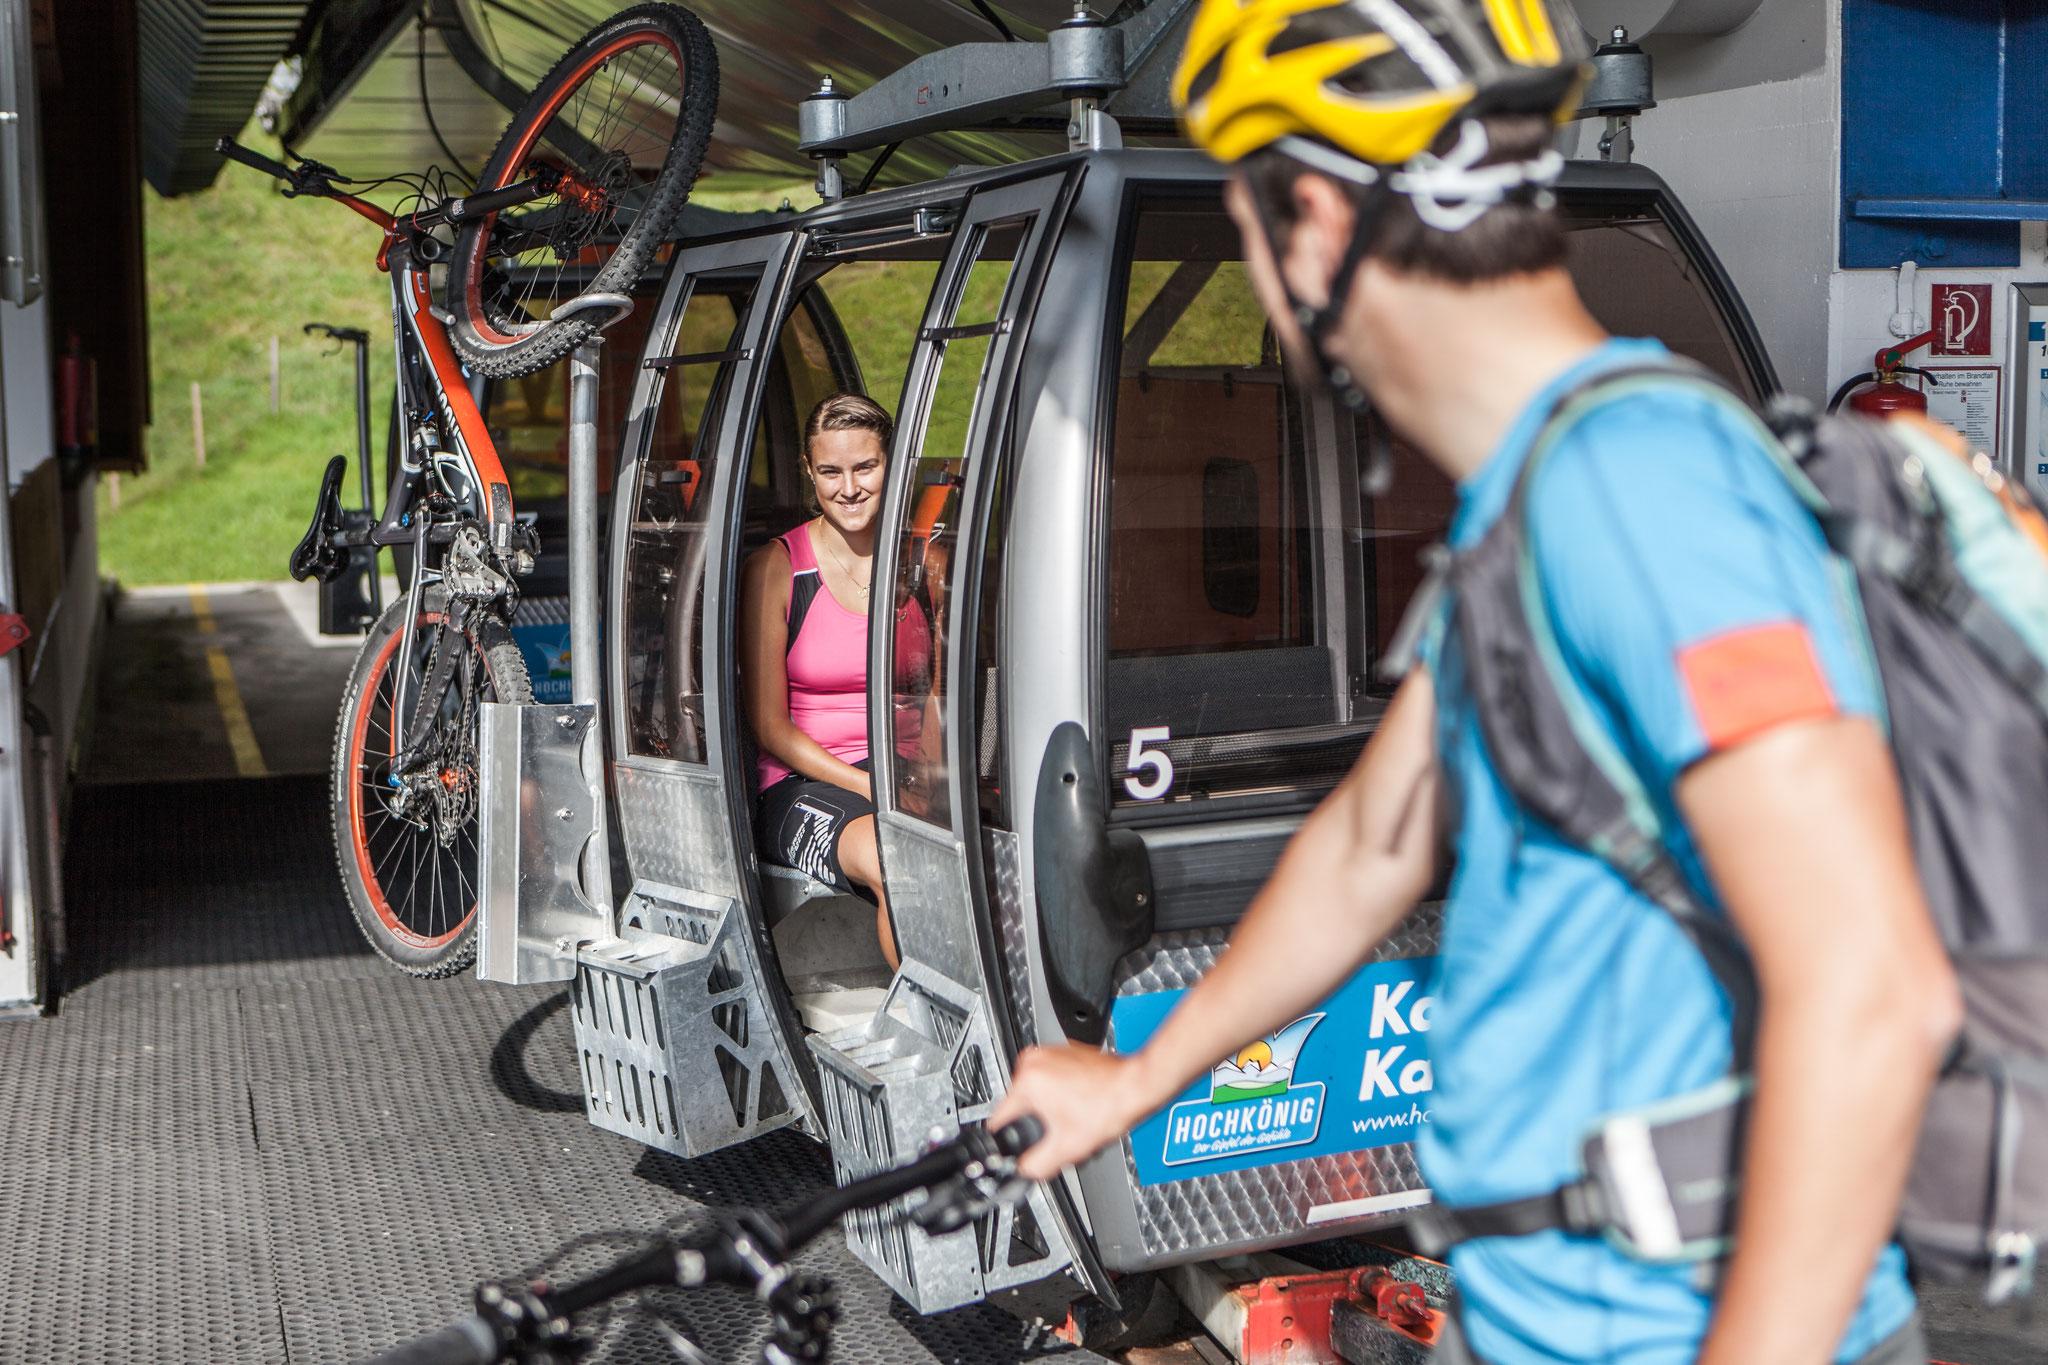 biketransport-sommerbahnen-hochkoenig